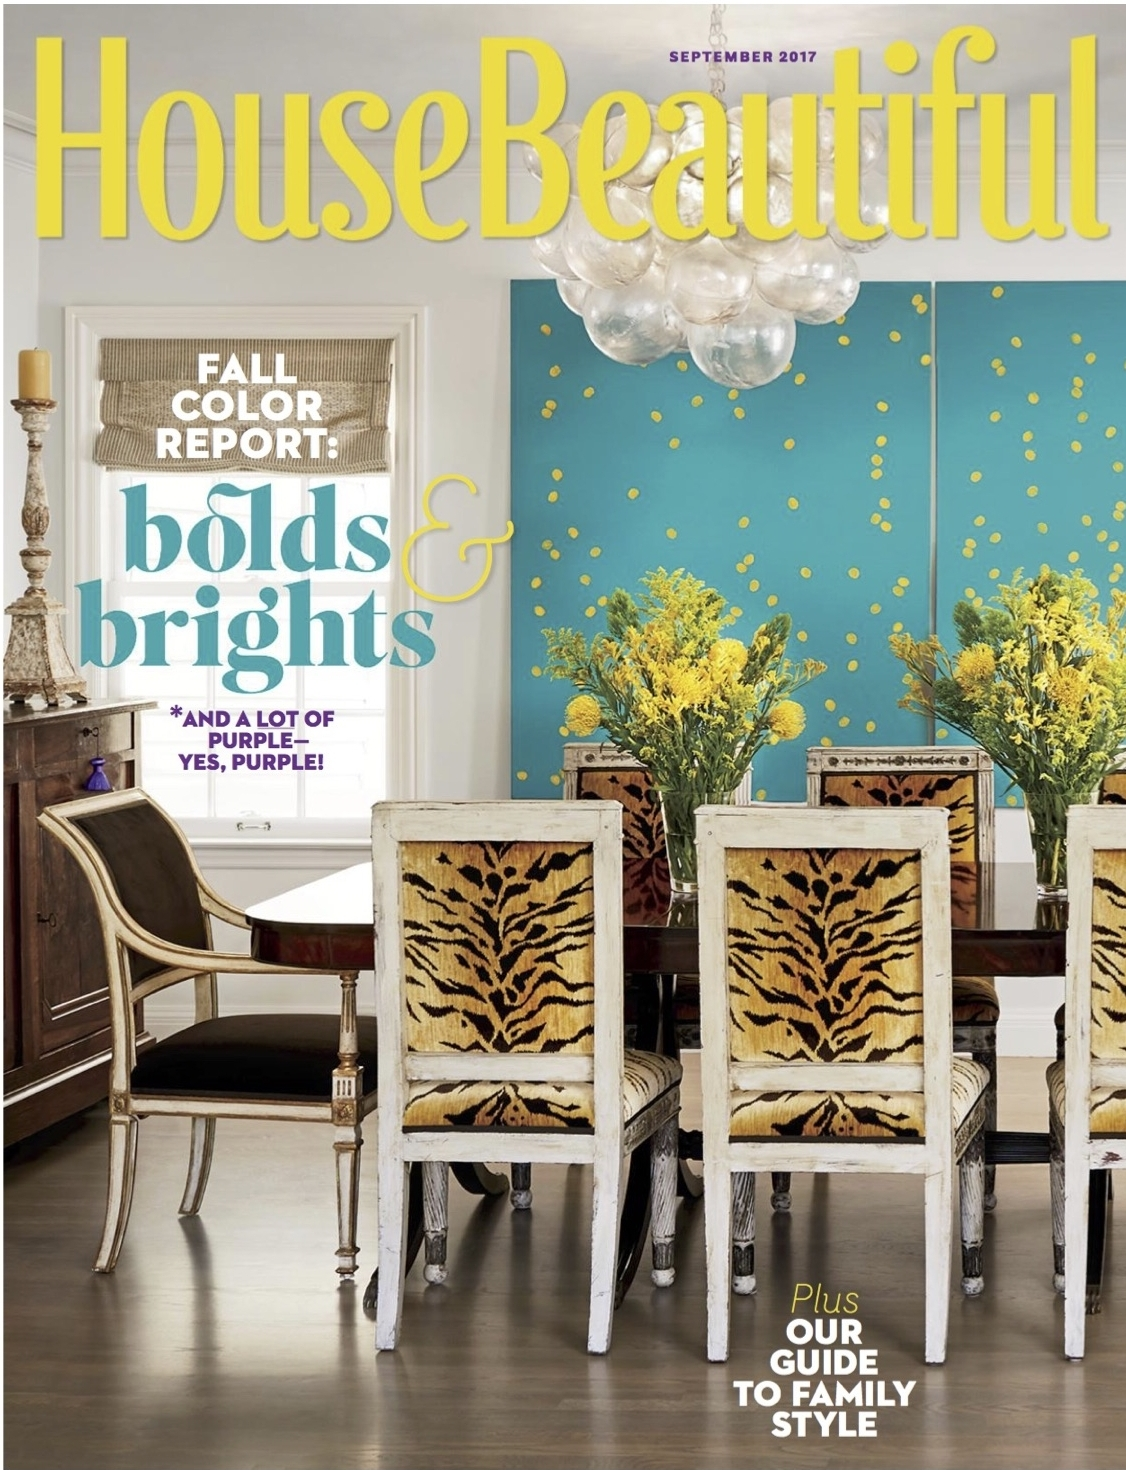 House Beautiful Magazine - Interior design in Boston by Dane Austin Design